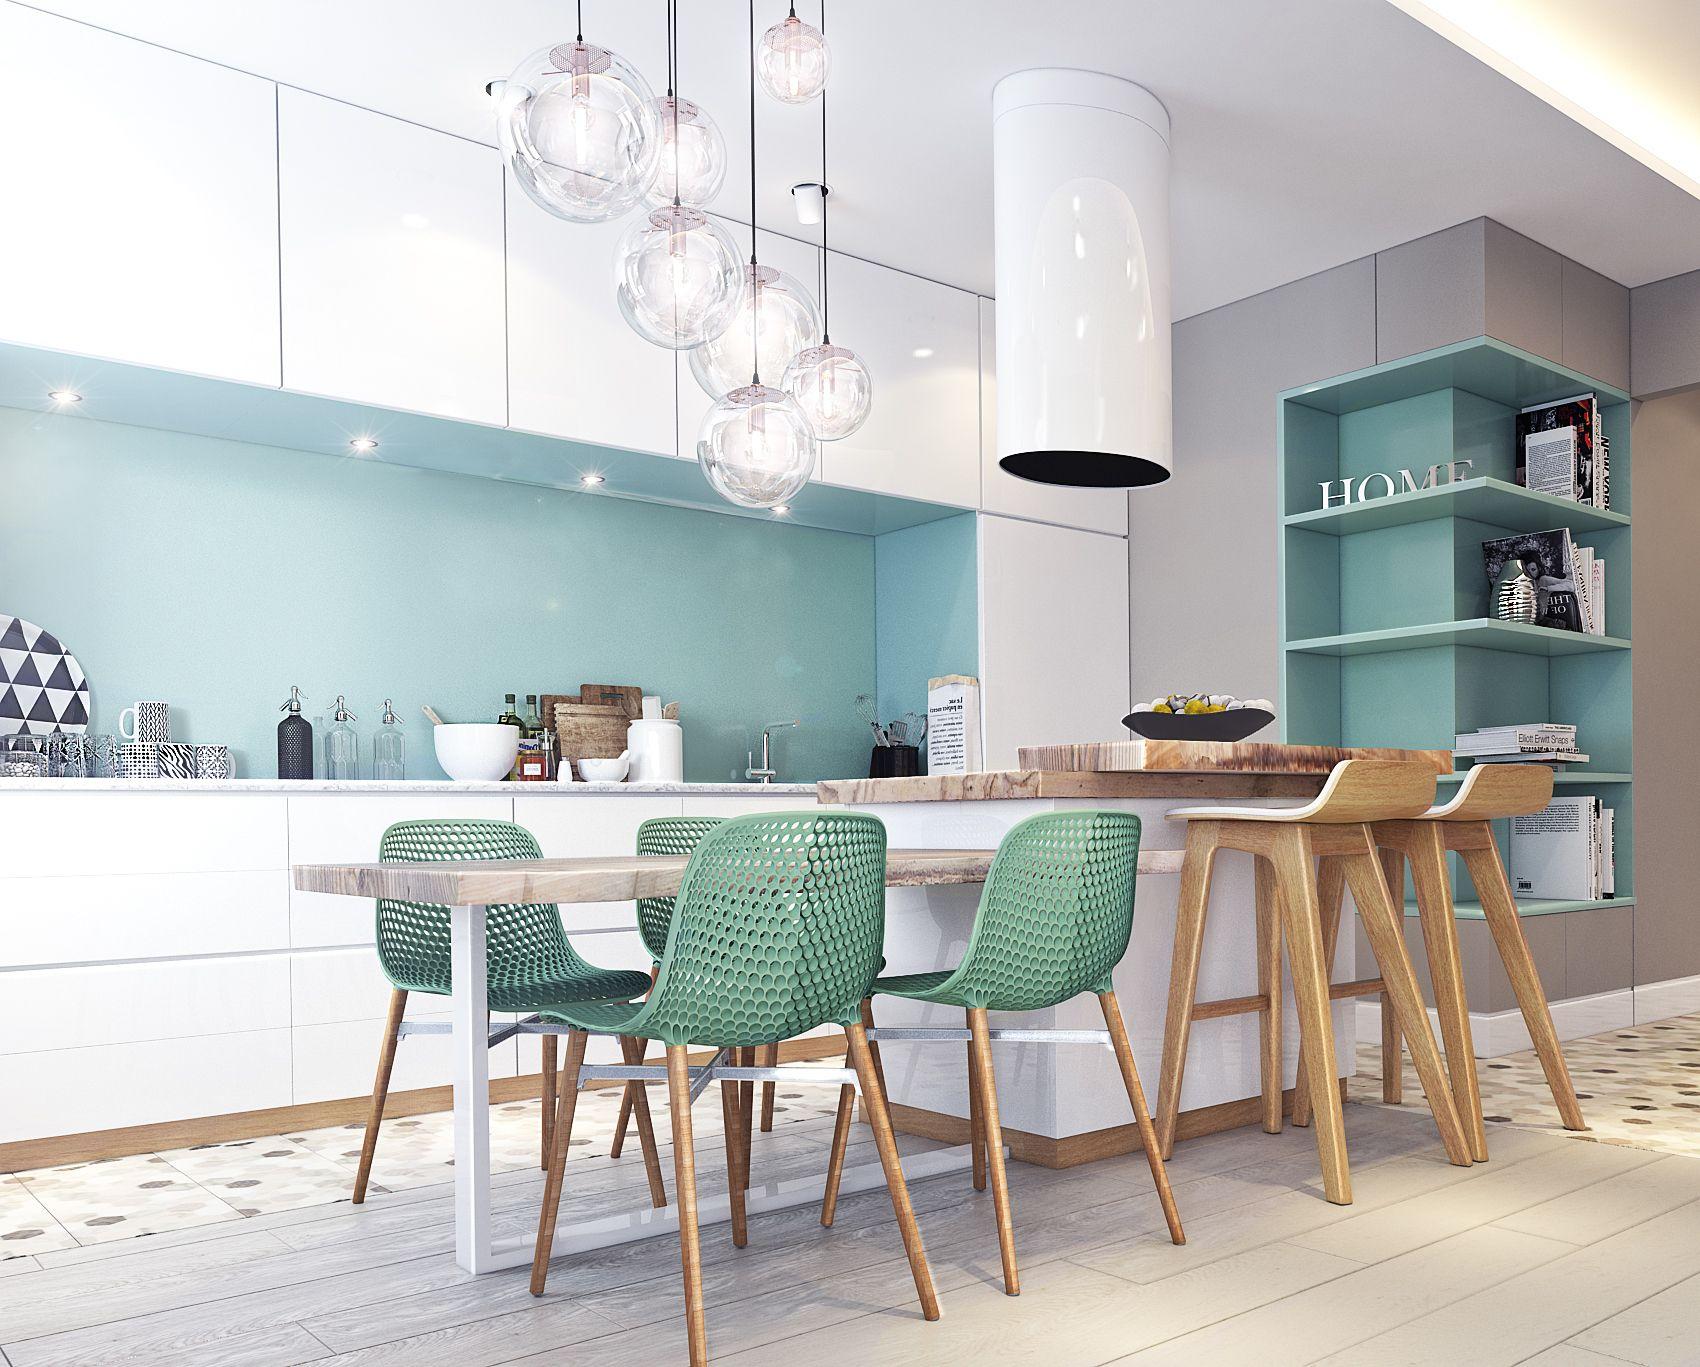 Pin by Mervi Lill on köök | Pinterest | Kitchens, Interiors and ...